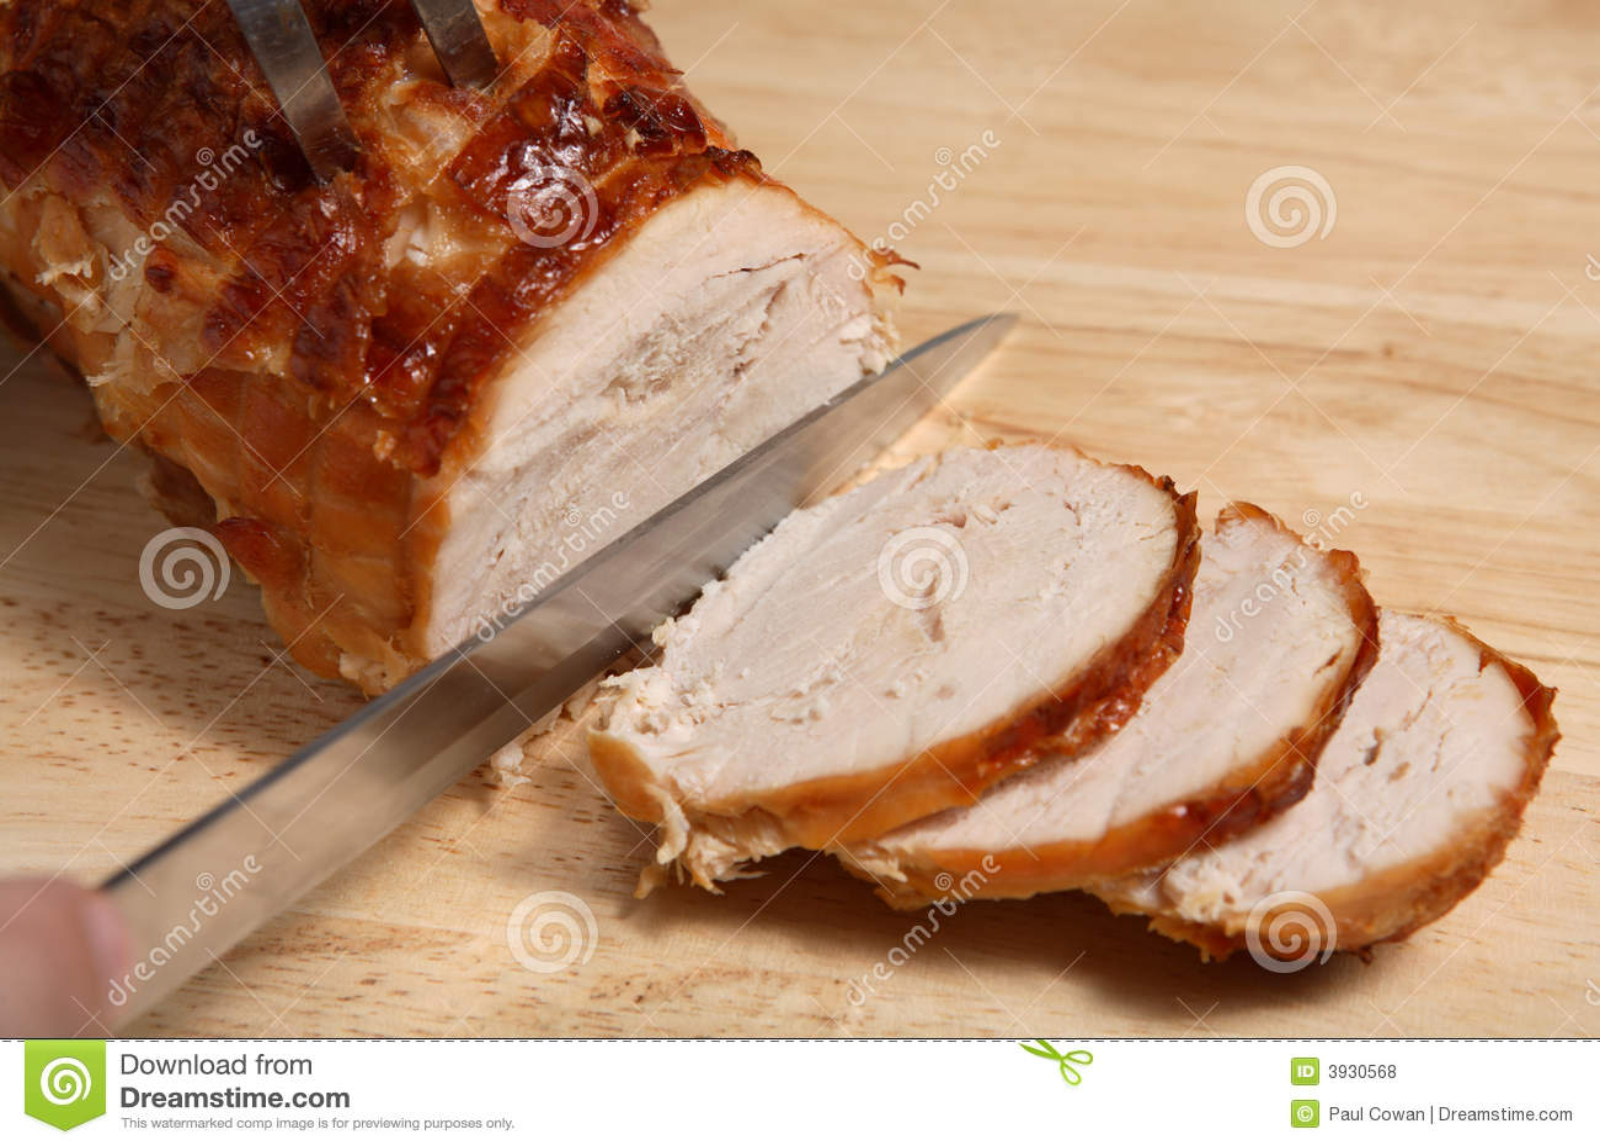 Chopping Board Knife